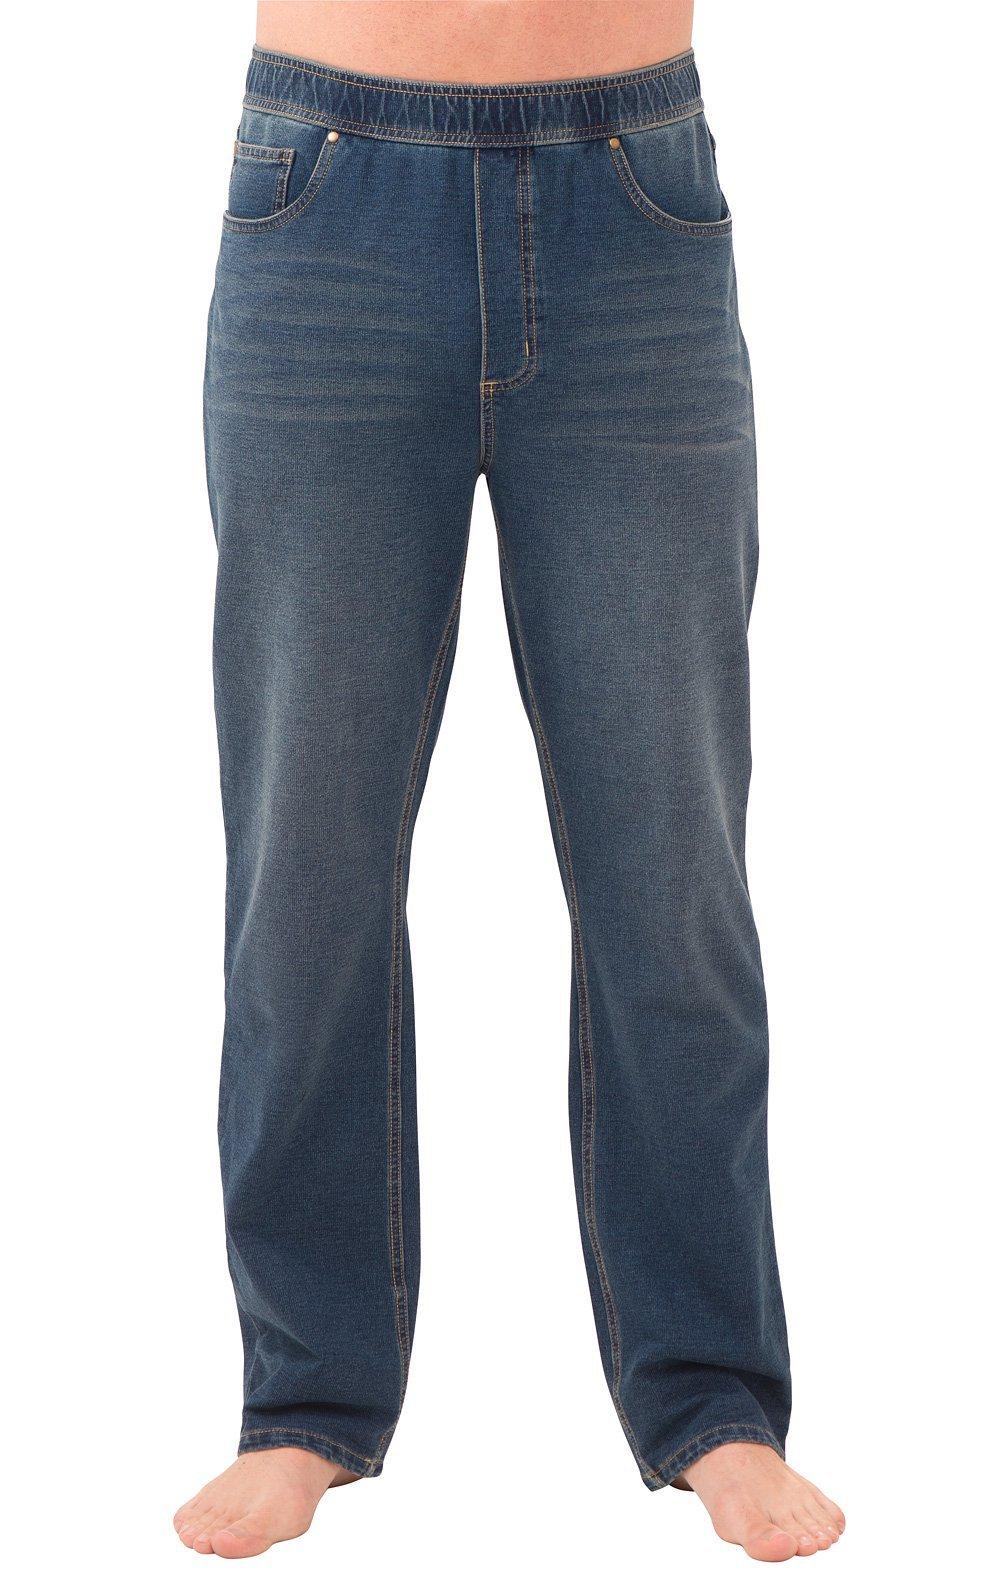 692c00689137e PajamaJeans Men's Straight Leg Knit Denim Jeans - Denim Fit